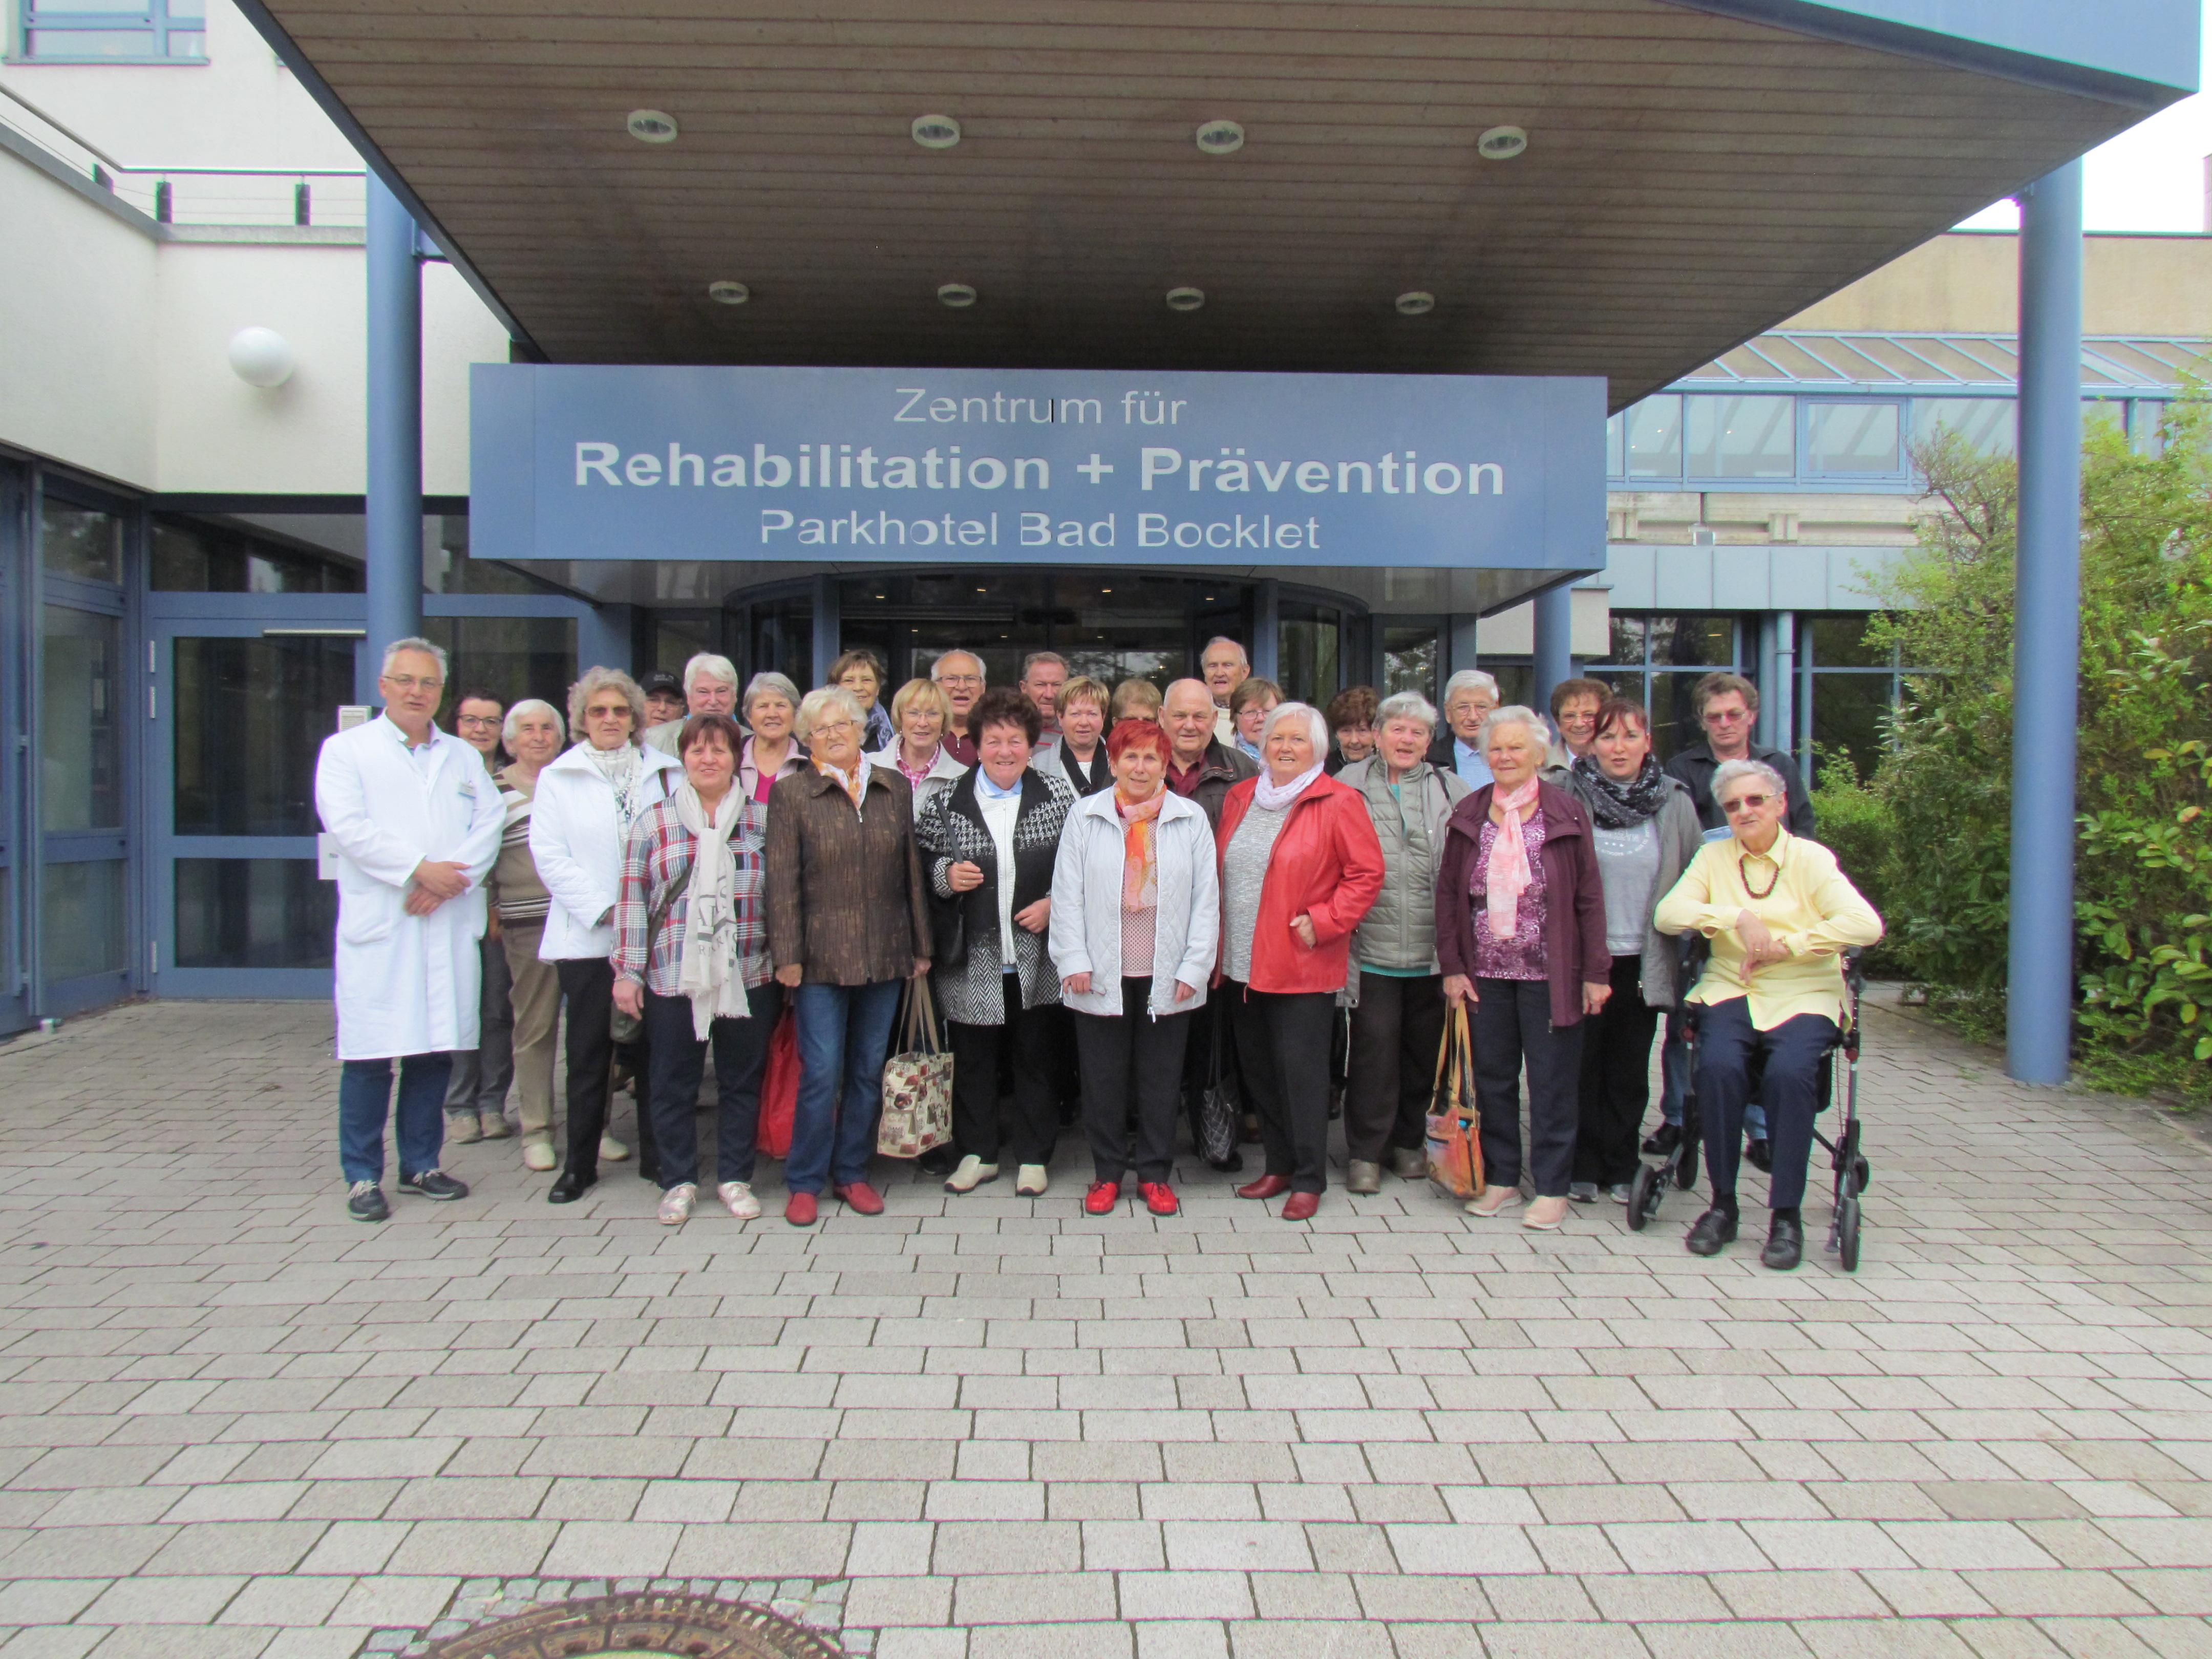 Fahrt nach Bad Bocklet am 4. Mai 2017